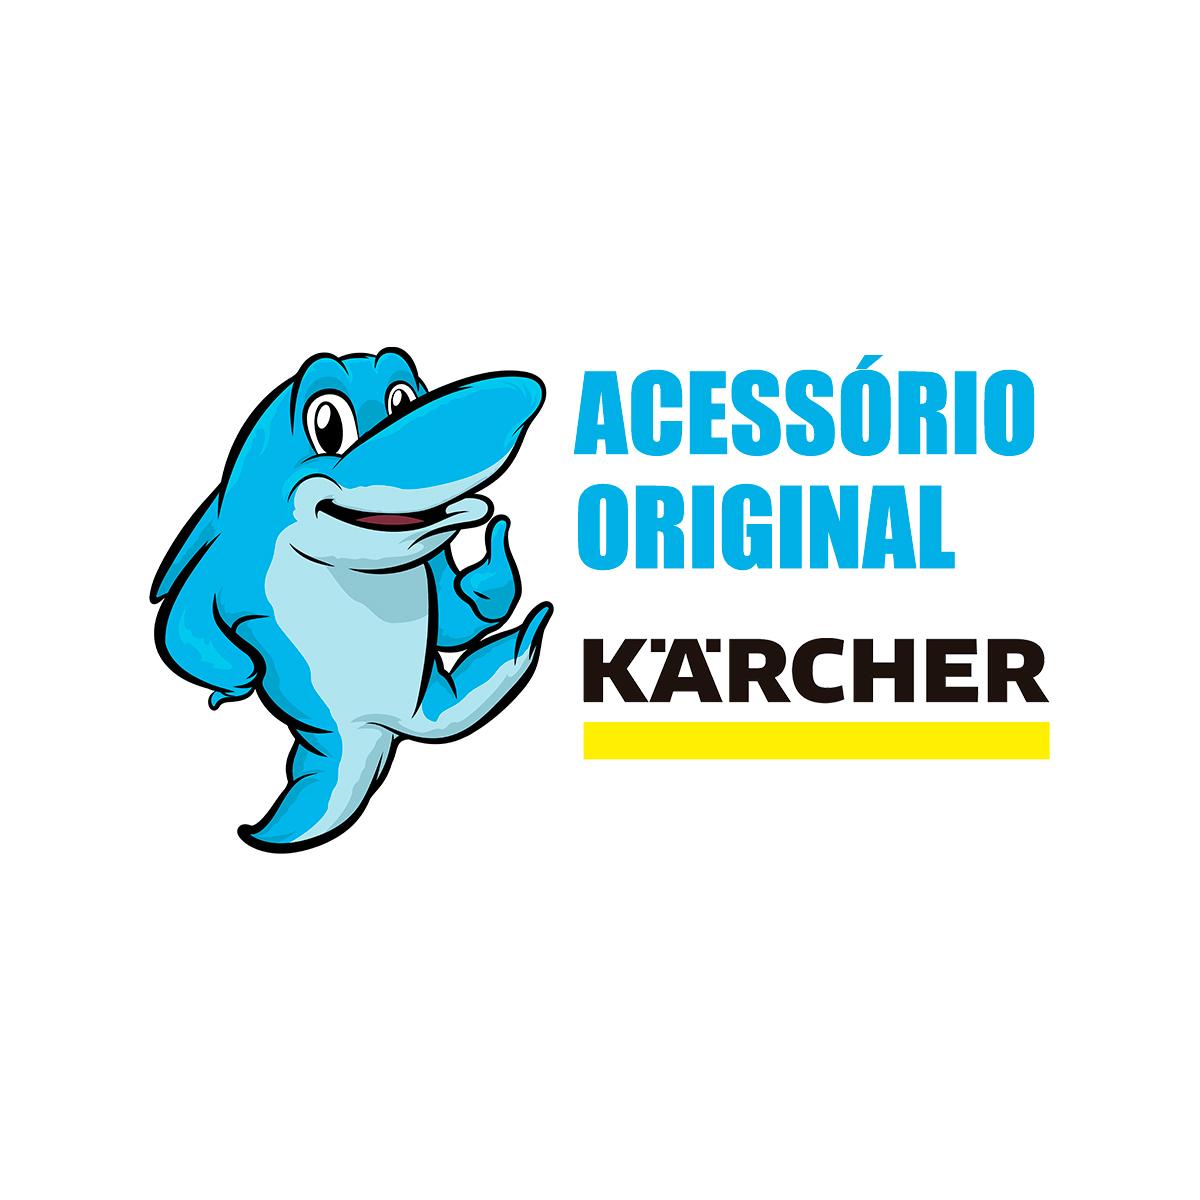 Filtro para Aspirador de pó Karcher A2003 NT201 Novo Original